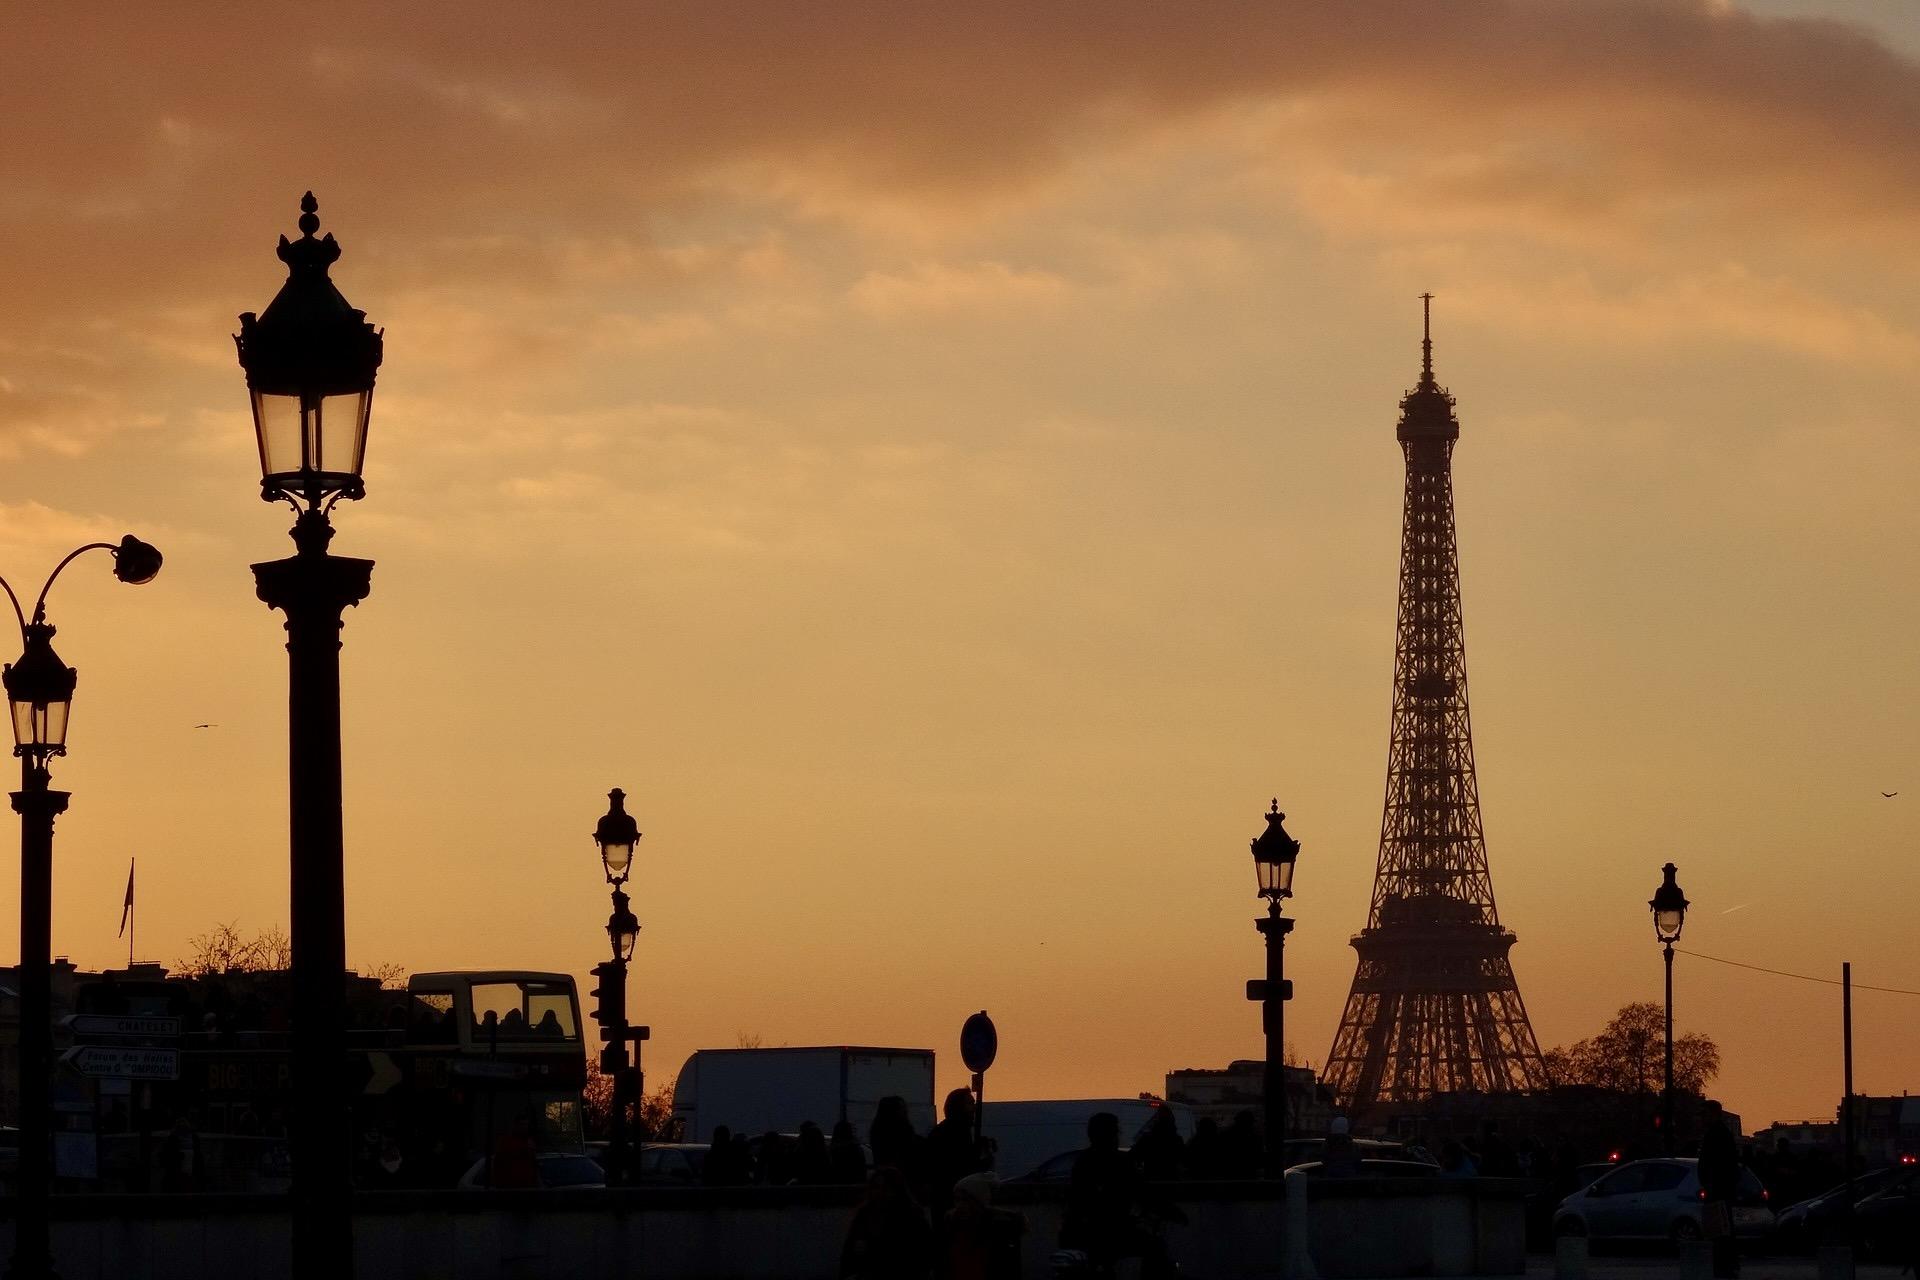 Reiseziele im Februar? Definitiv Paris zum Valentinstag.